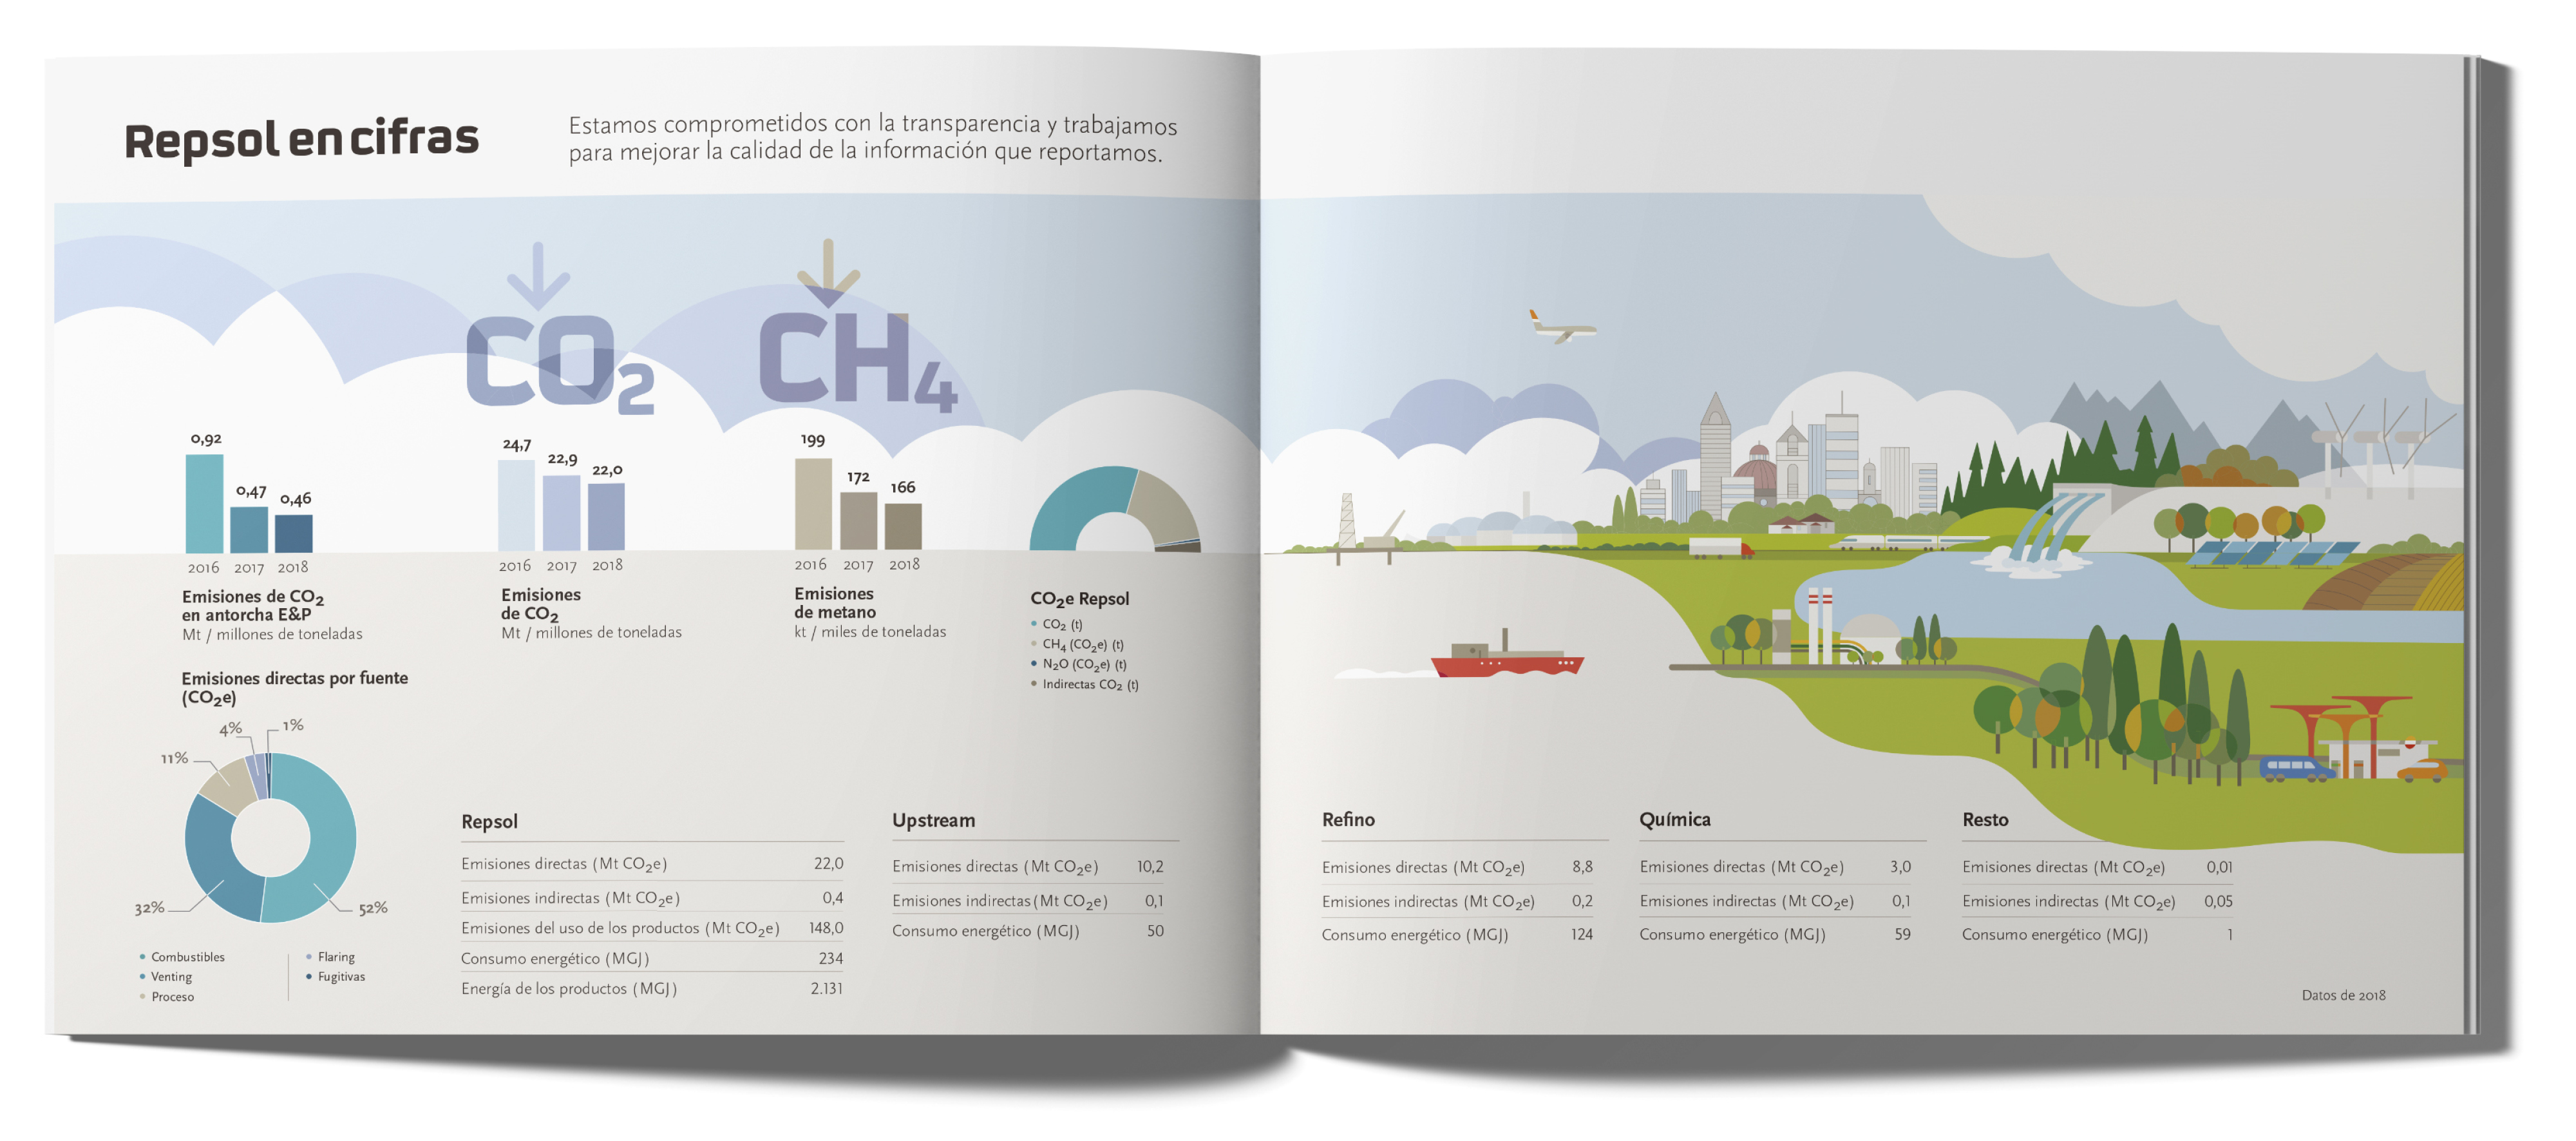 proyecto Cambio climatico Repsol_int 1_2018